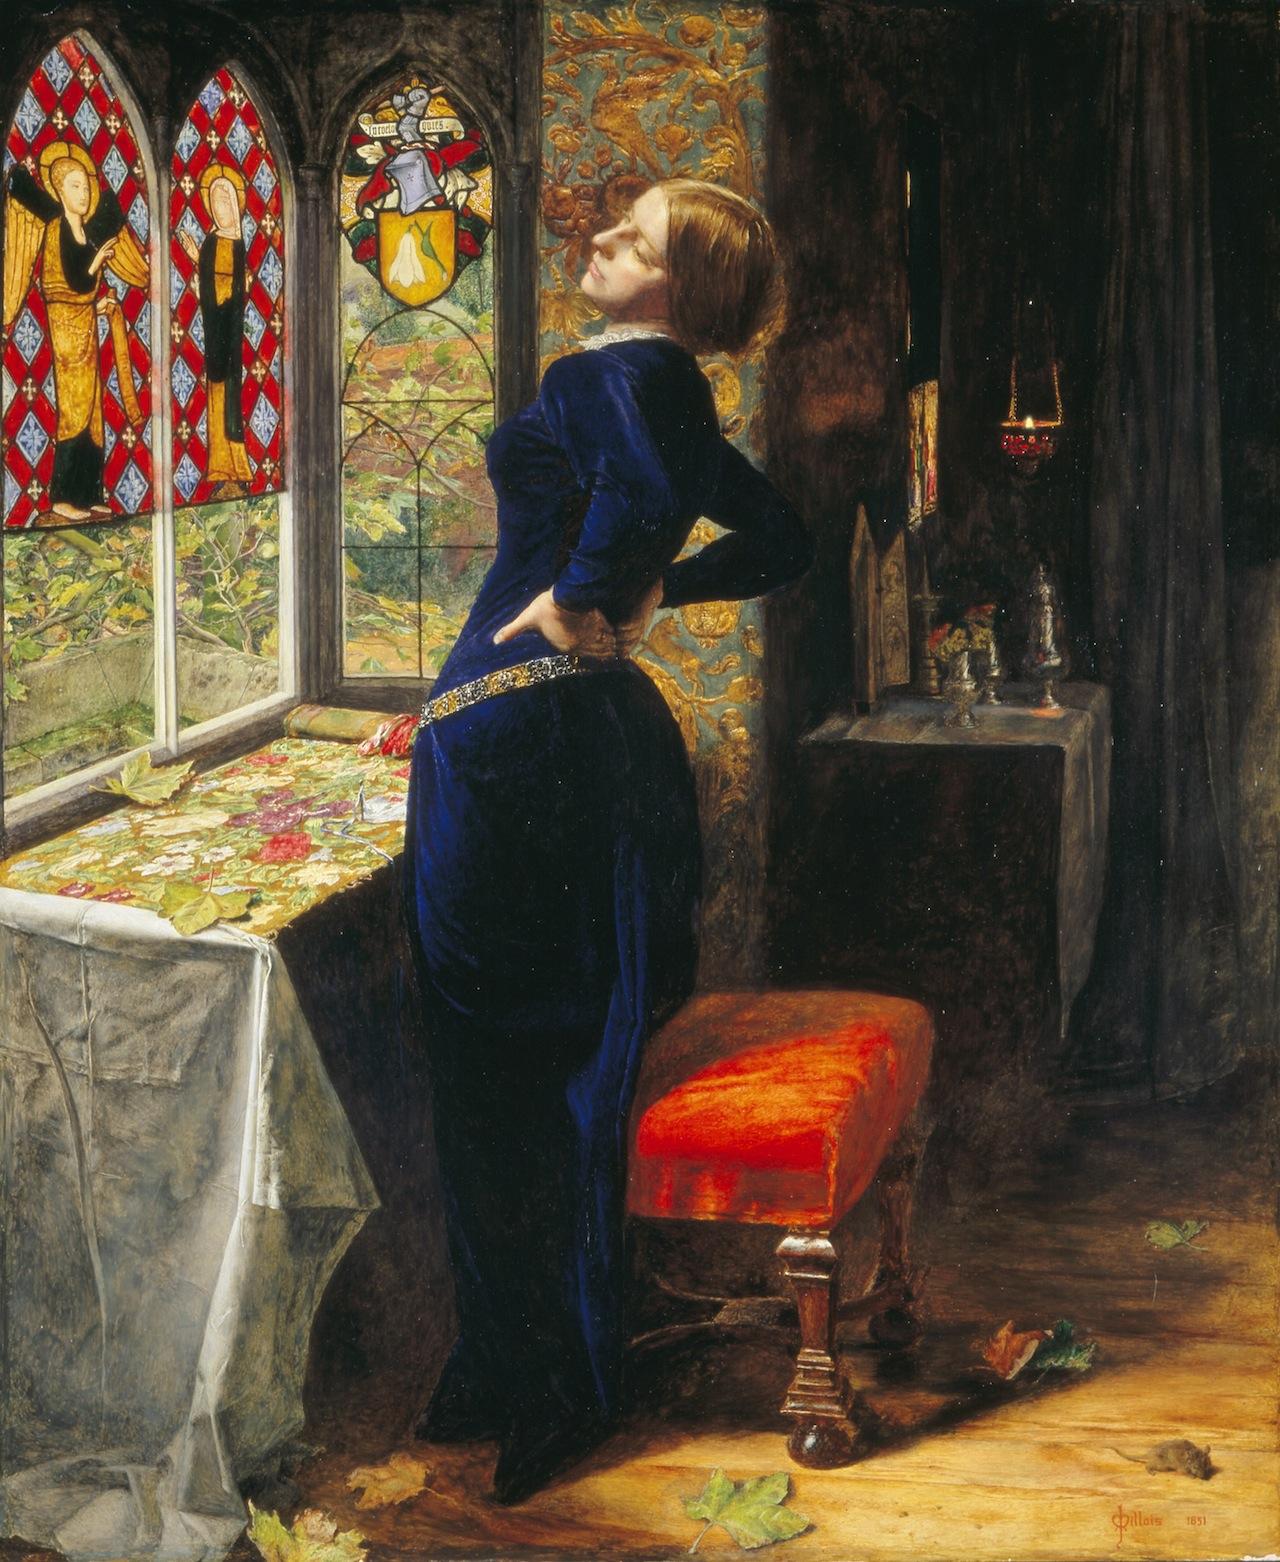 Sir John Everett Millais, Mariana, 1851, oil on panel.  Tate, London, United Kingdom/Art Resource, NY.